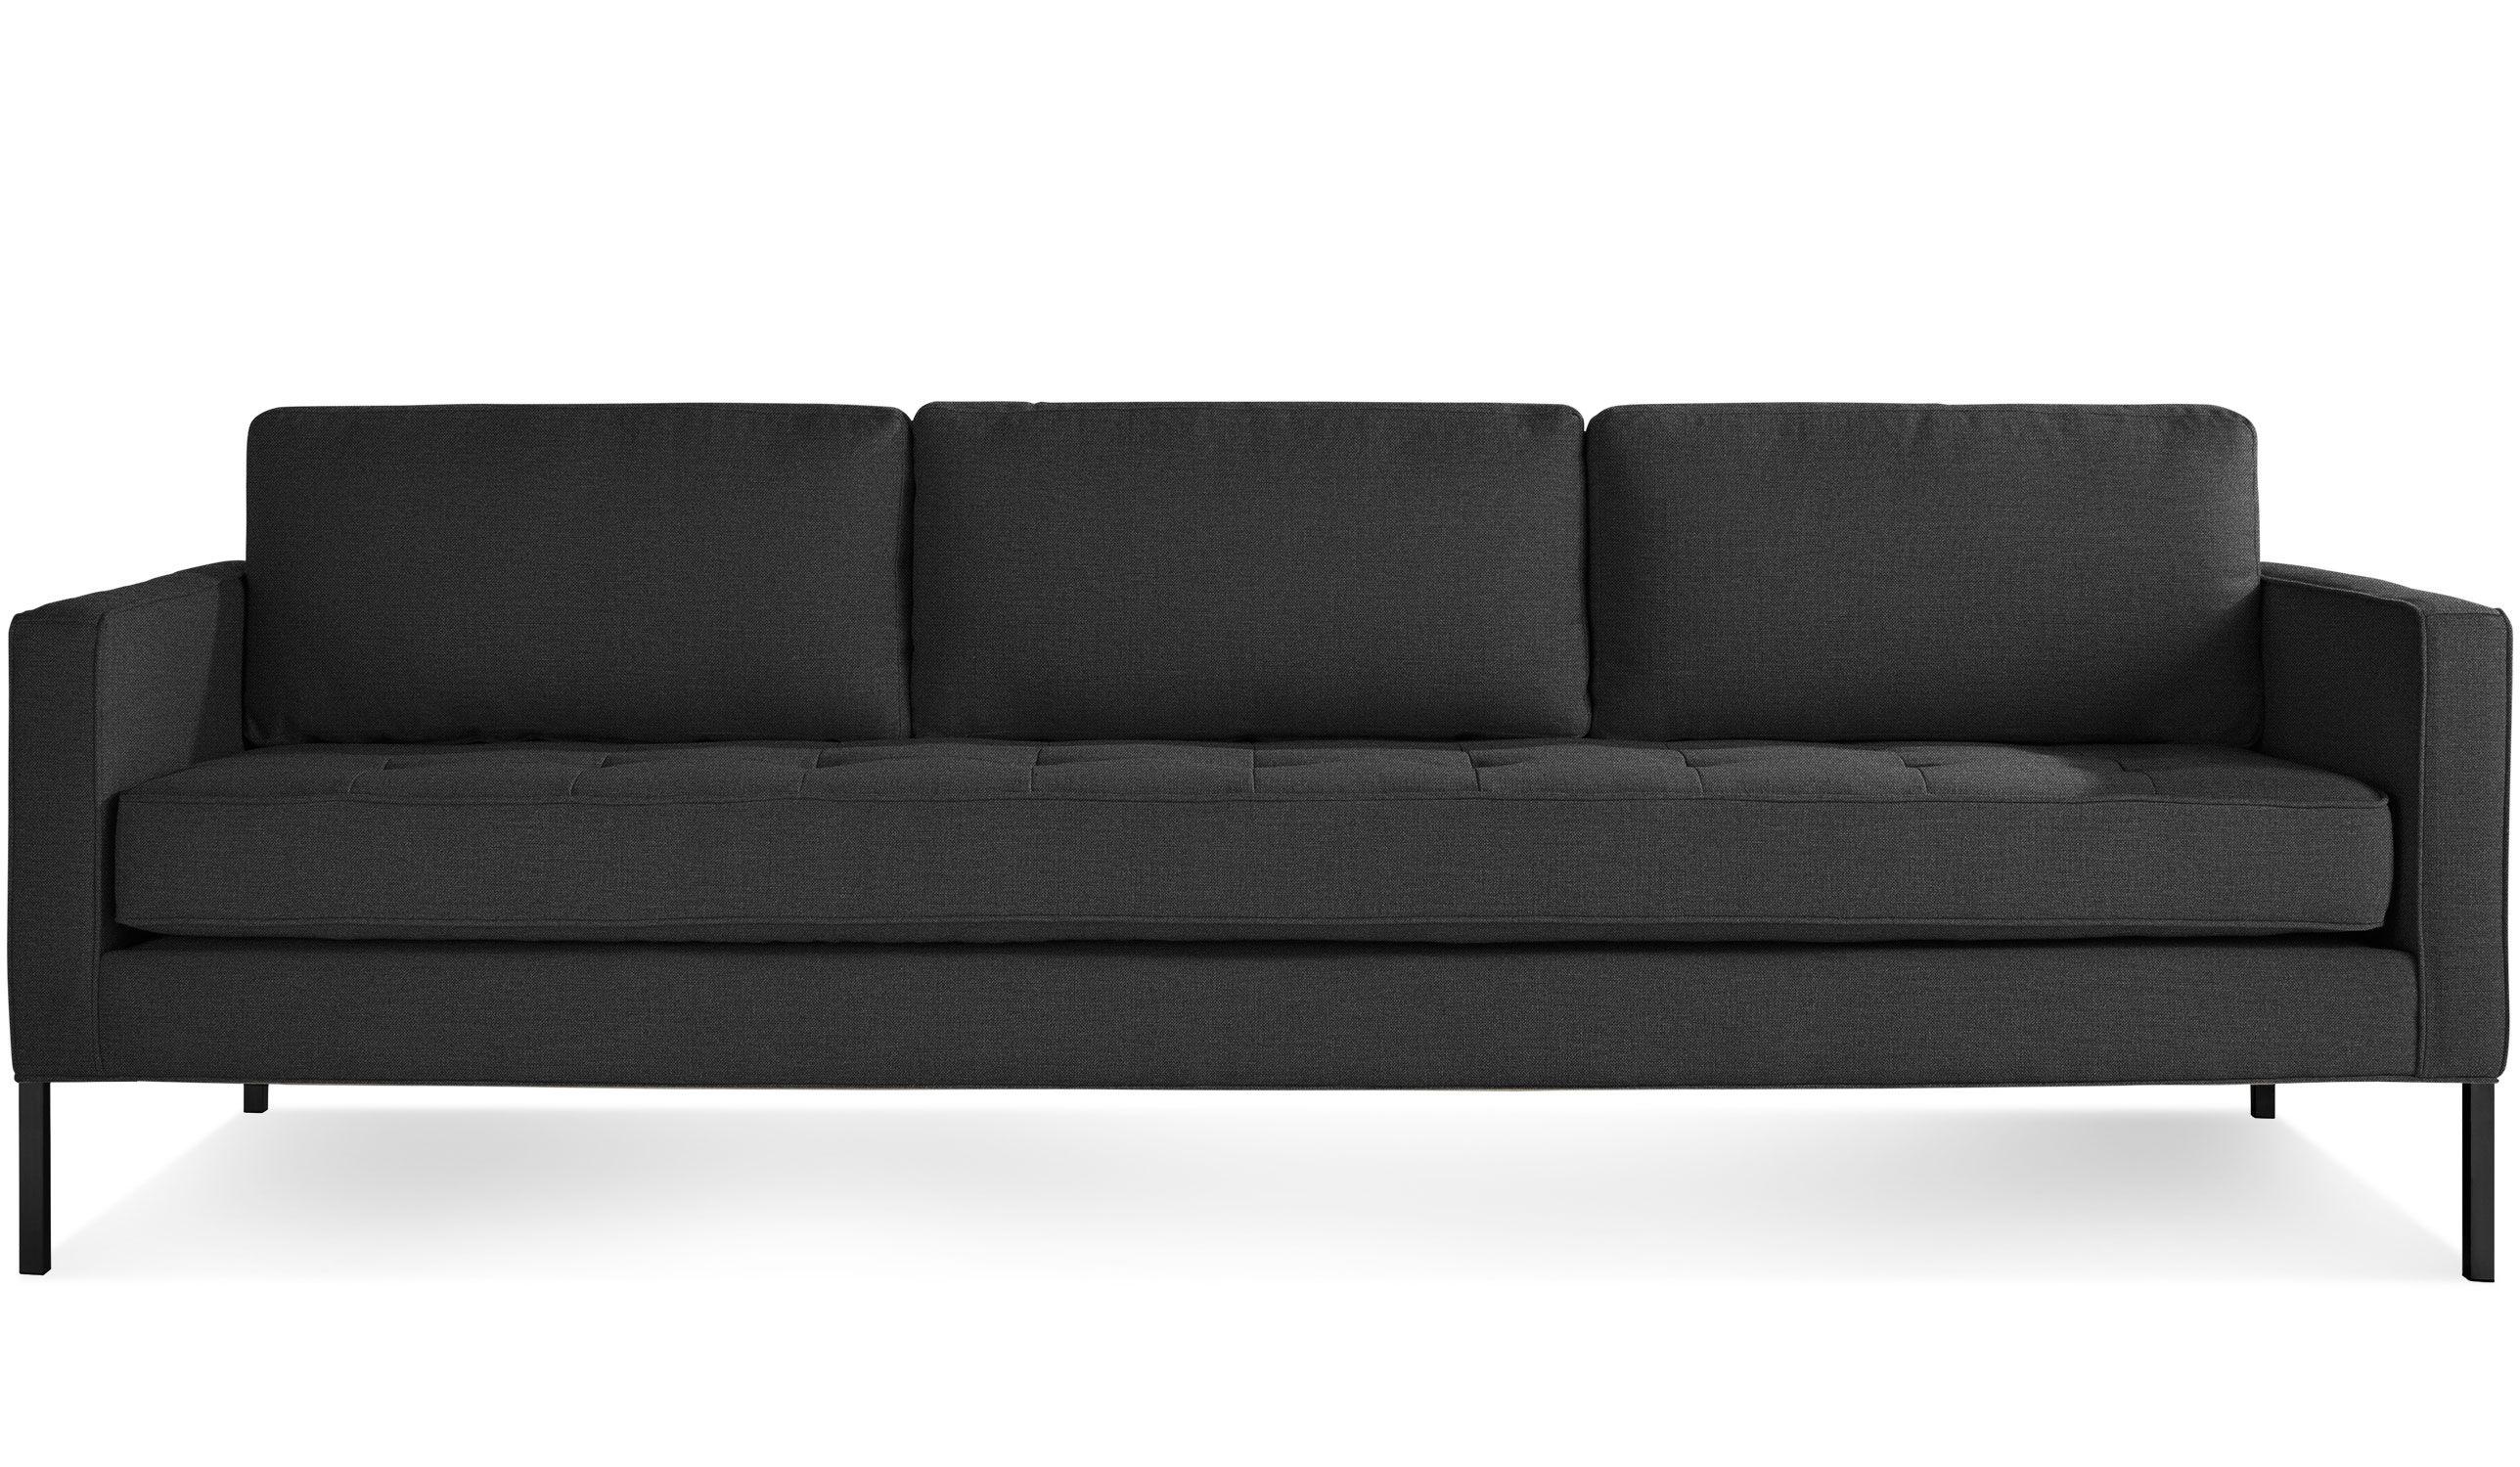 sofa frame making resource black cushions paramount 96 inch hivemodern